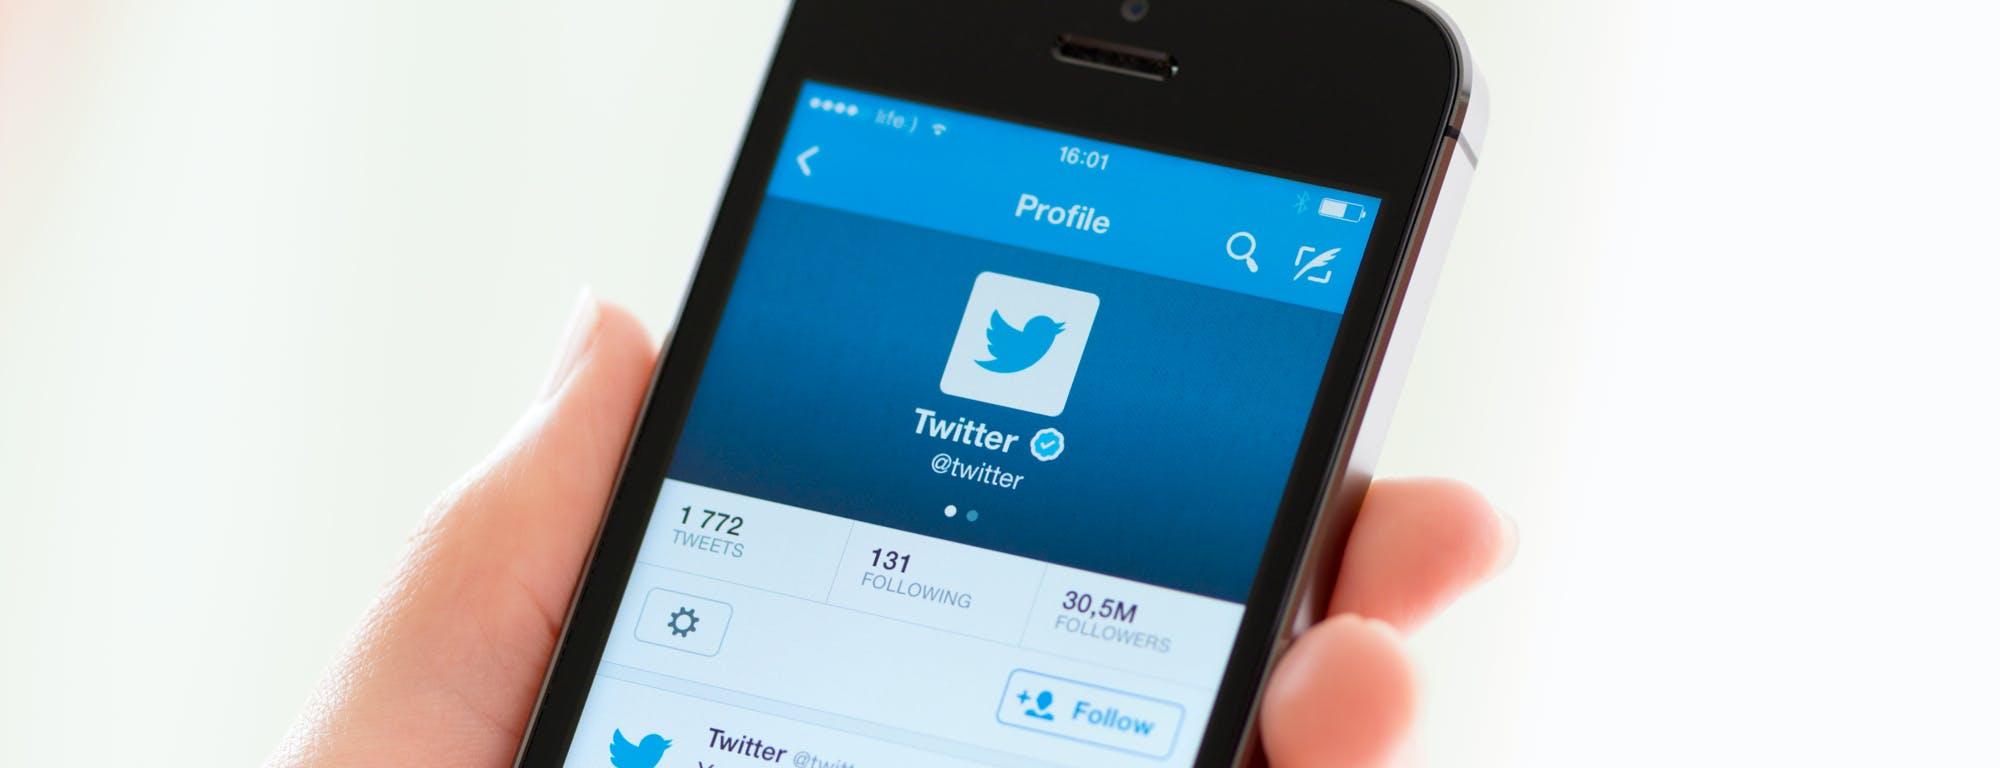 TwitterSmartphone-Product-2014